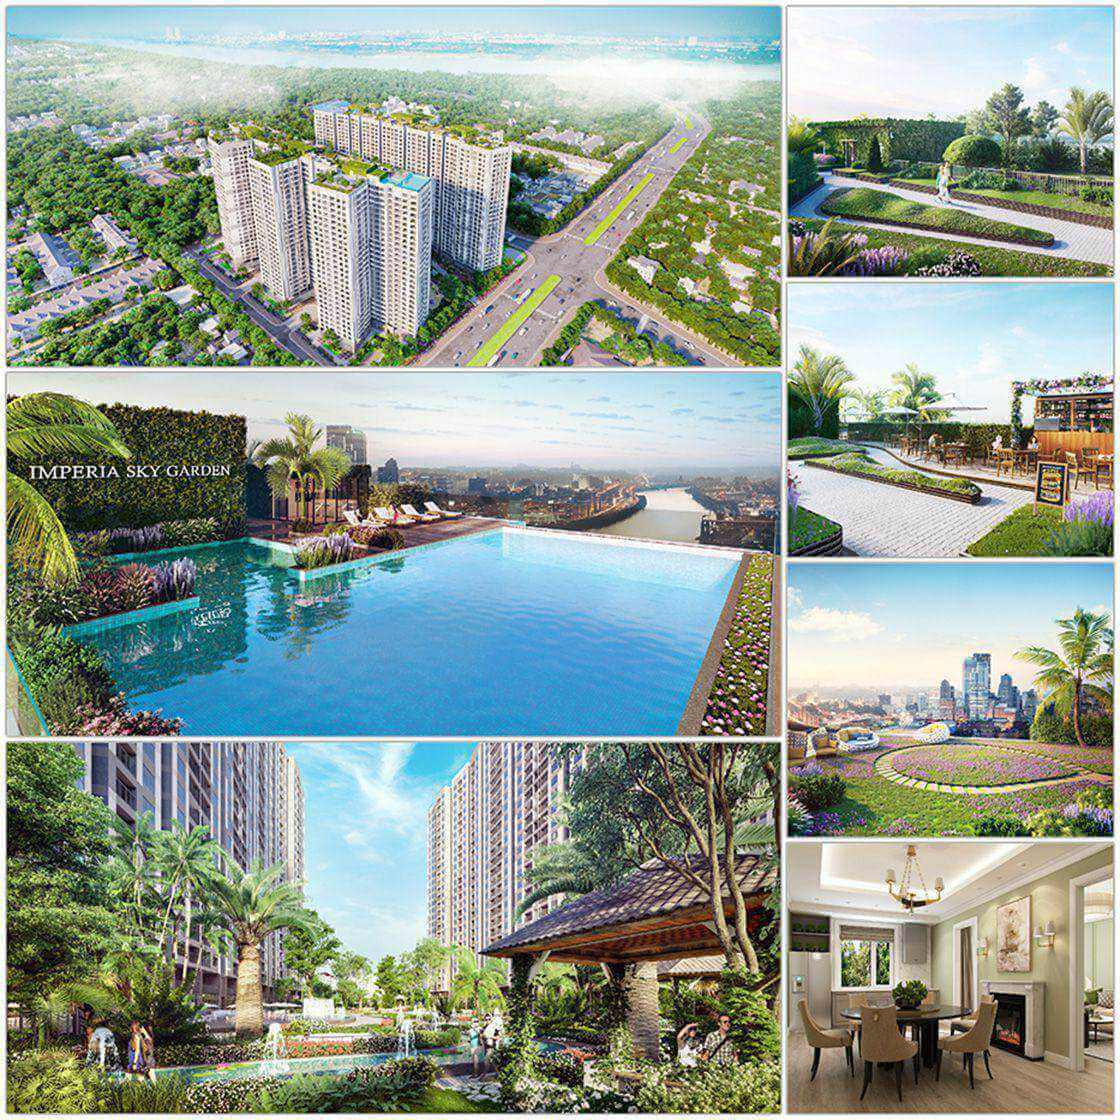 Hệ thống tiện ích dự án chung cư Imperia Sky Garden 423 Minh Khai